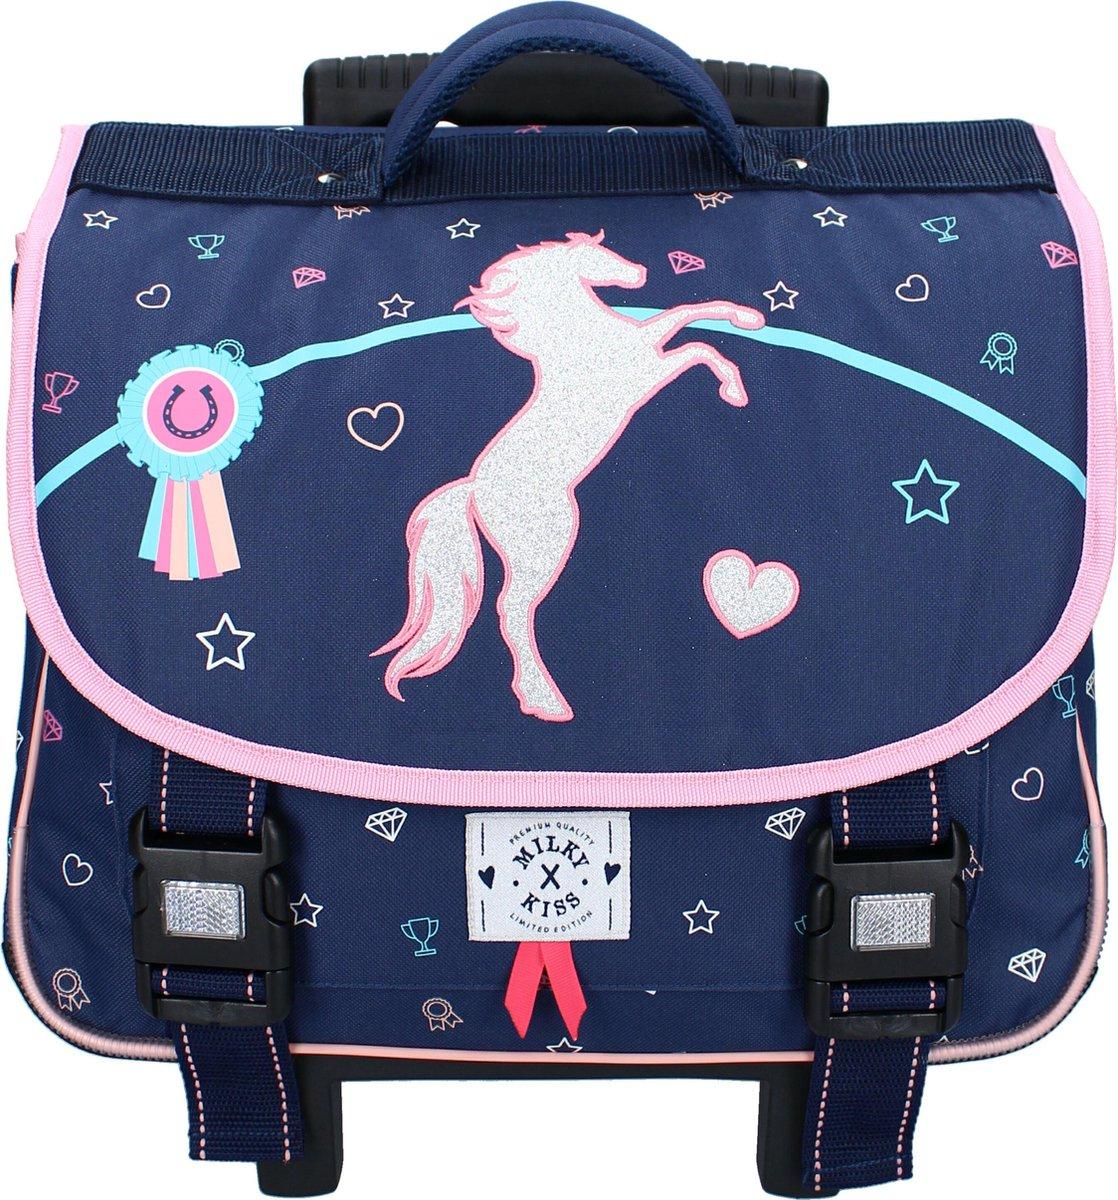 Milky Kiss Live Love Ride Schoolrugzaktrolley - 17,7 L - Navy Blauw